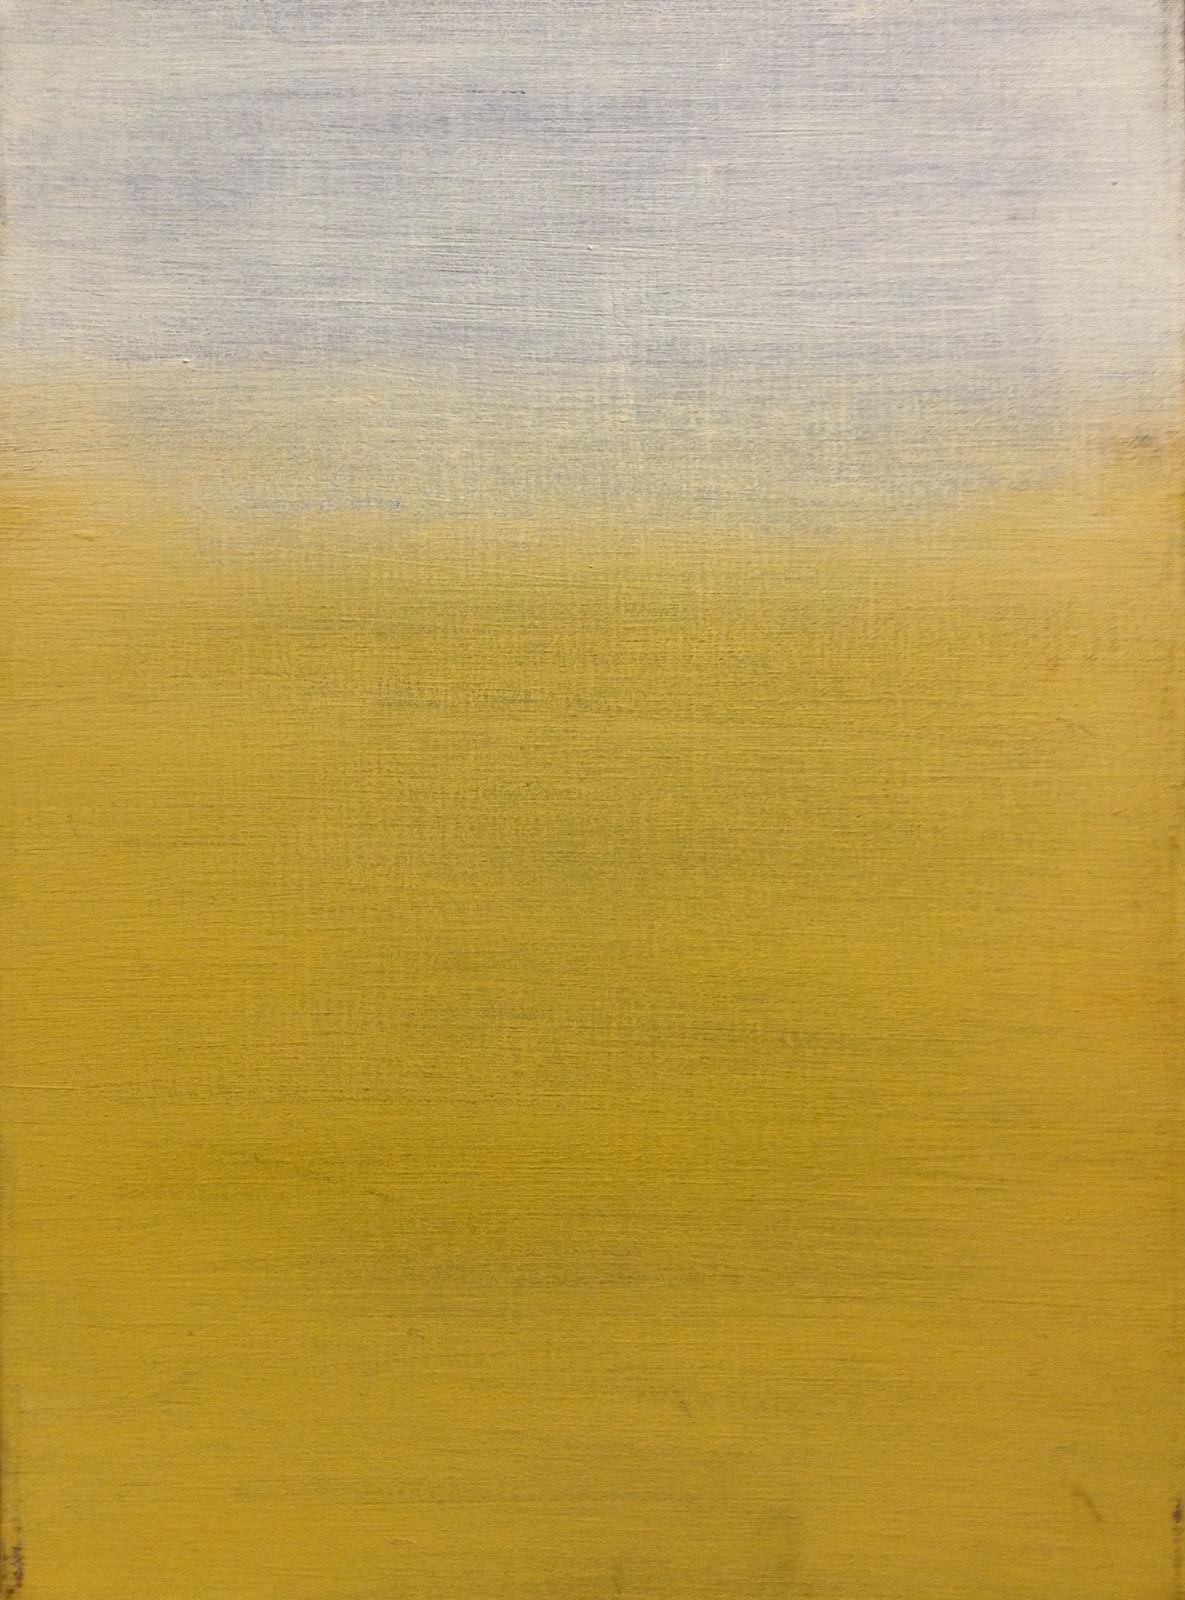 MacD-color-ptg,-yellow-fade_web.jpg